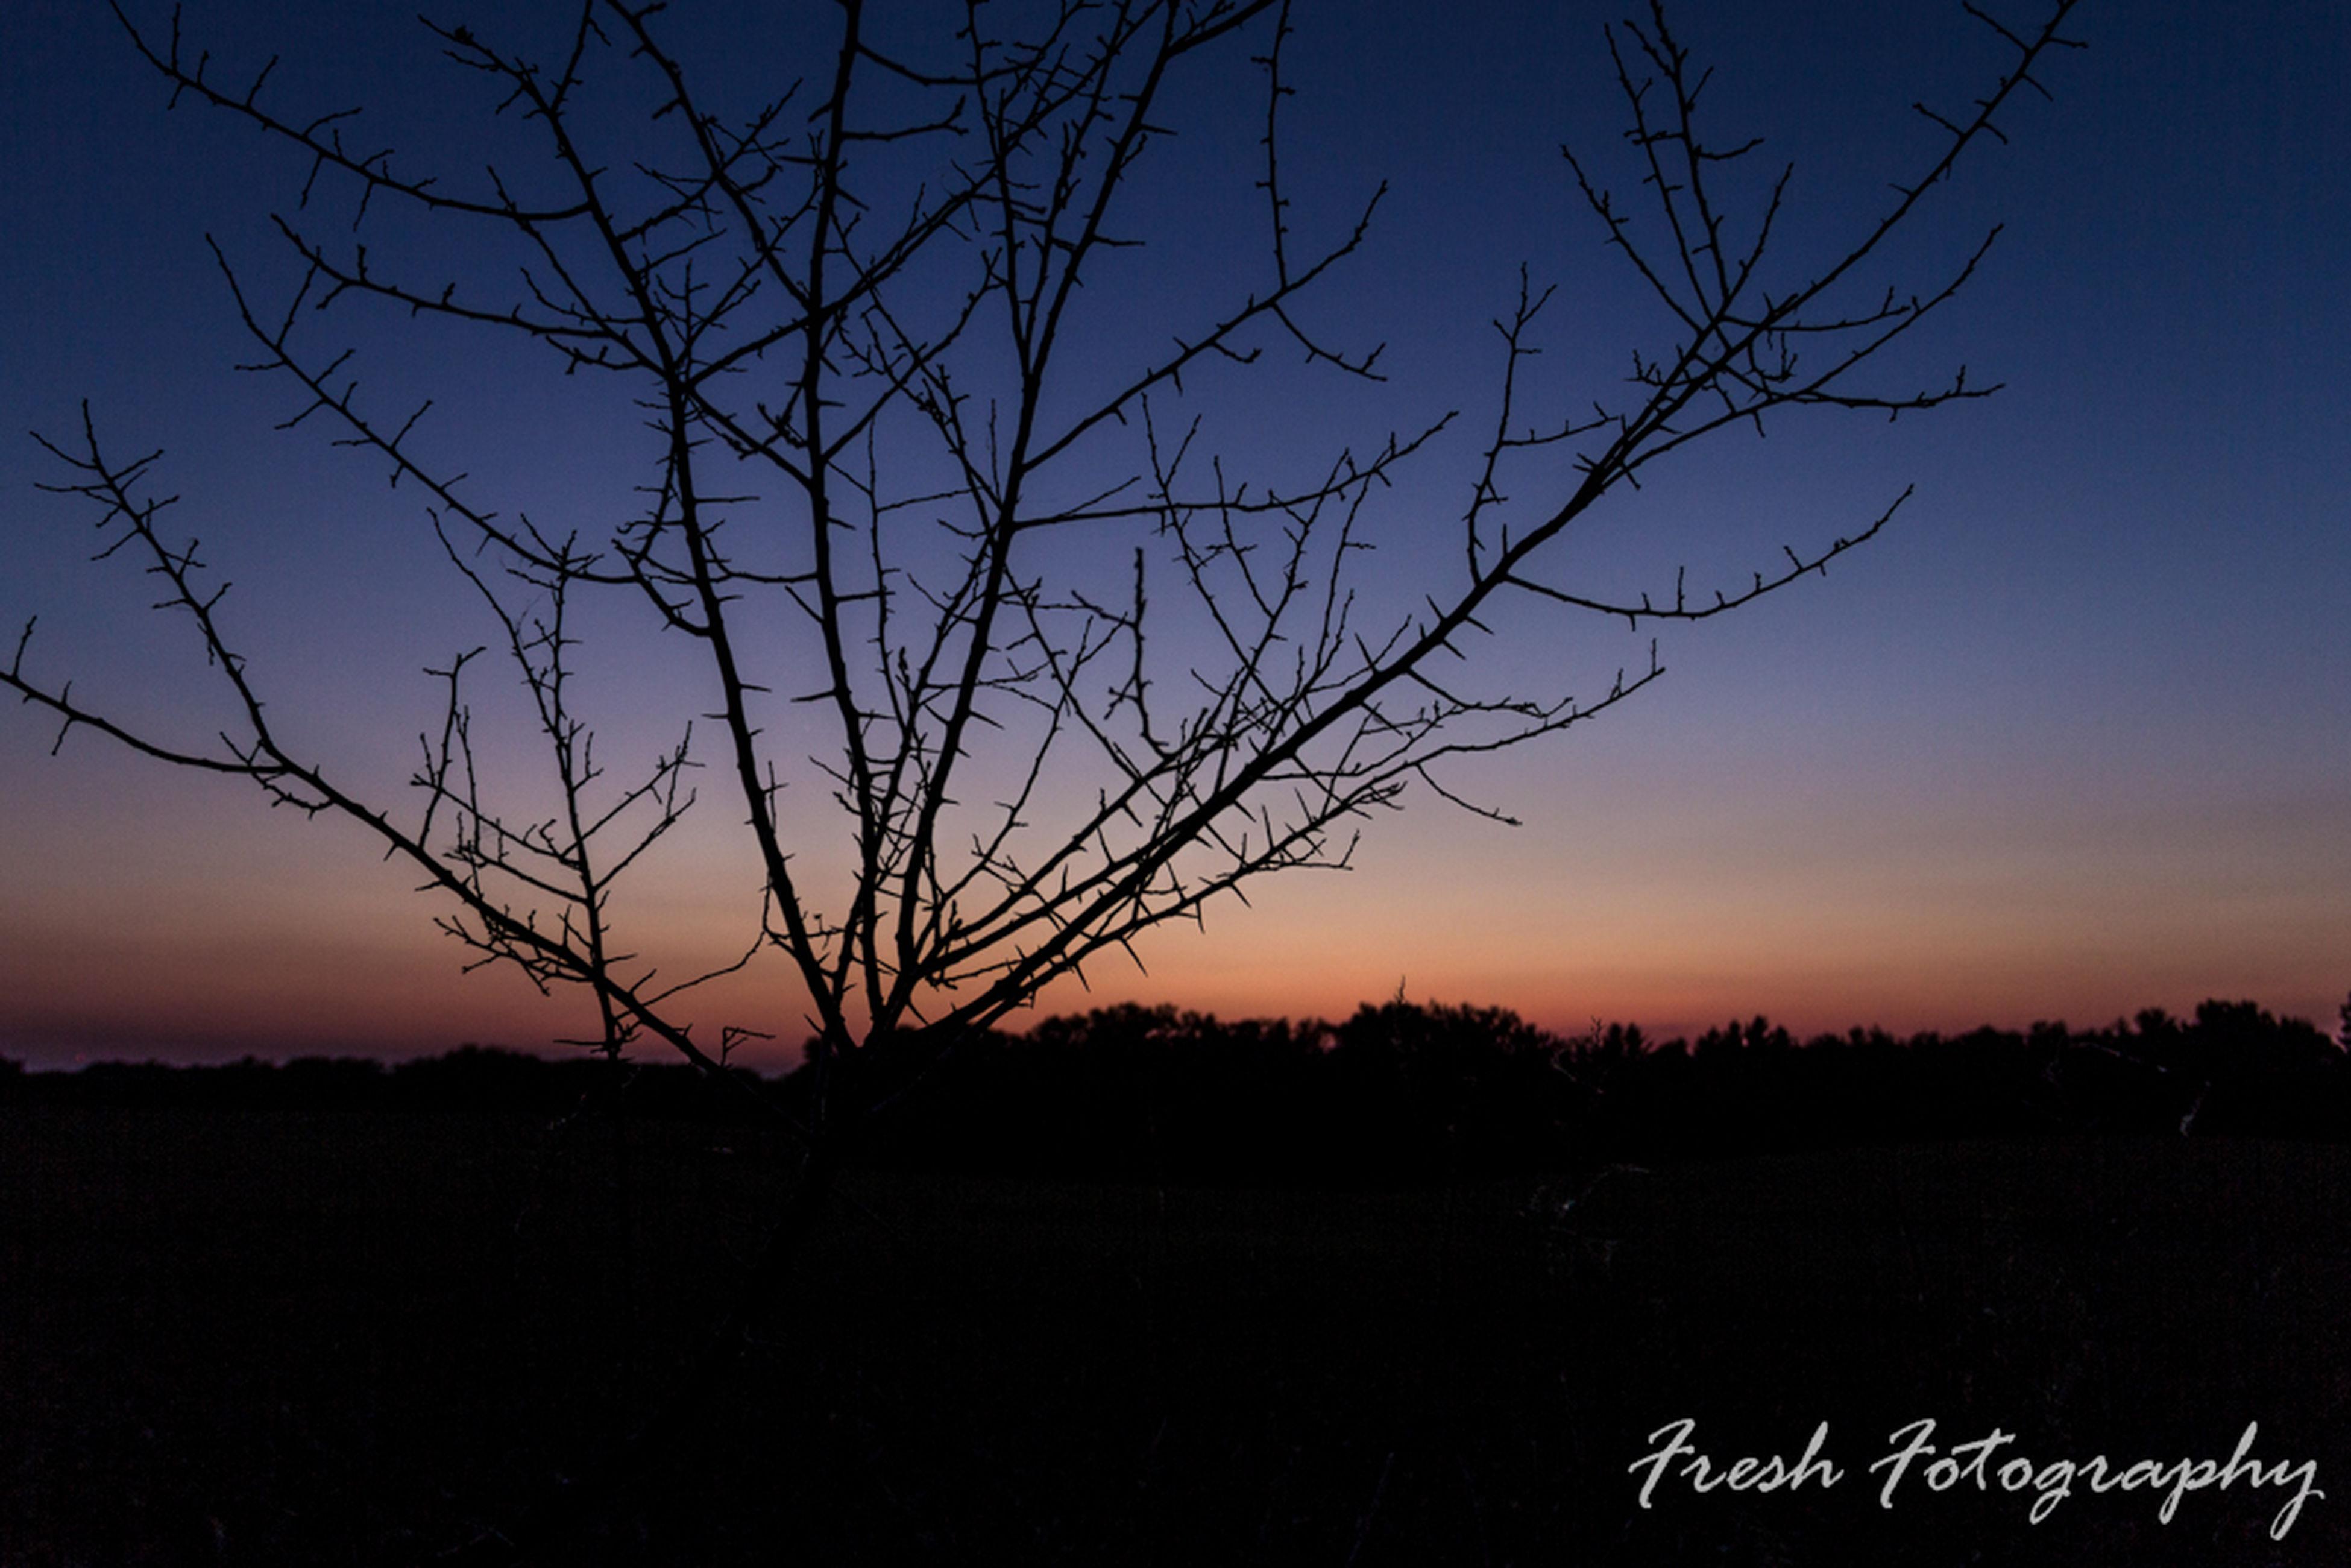 bare tree, silhouette, sunset, tranquility, tree, tranquil scene, scenics, branch, landscape, beauty in nature, nature, sky, idyllic, non-urban scene, no people, outdoors, non urban scene, remote, majestic, dark, outline, growth, horizon over land, rural scene, blue